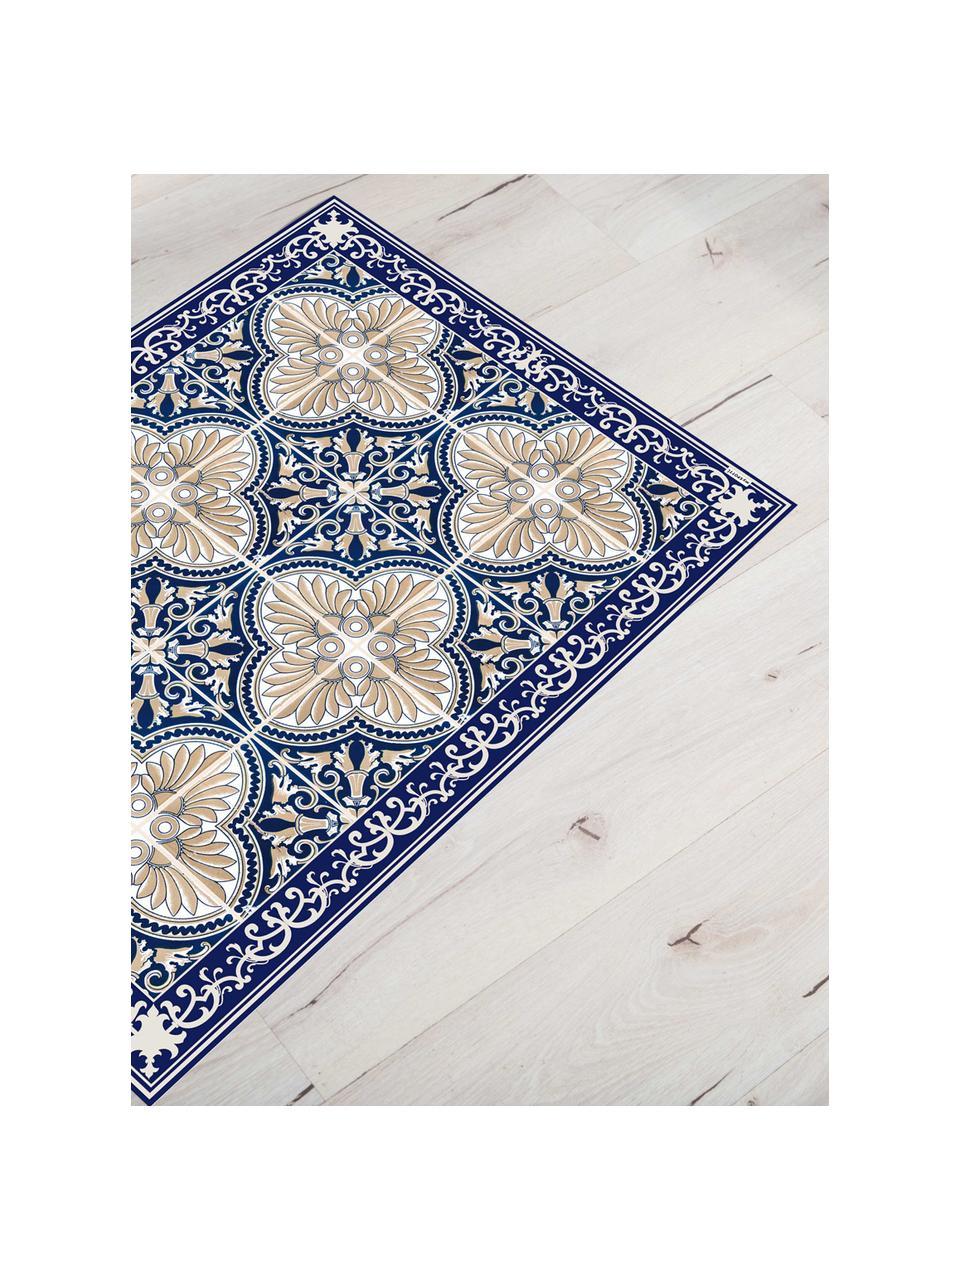 Vlakke vinyl vloermat Luis in blauw / beige, antislip, Recyclebaar vinyl, Blauw, beige, 136 x 203 cm